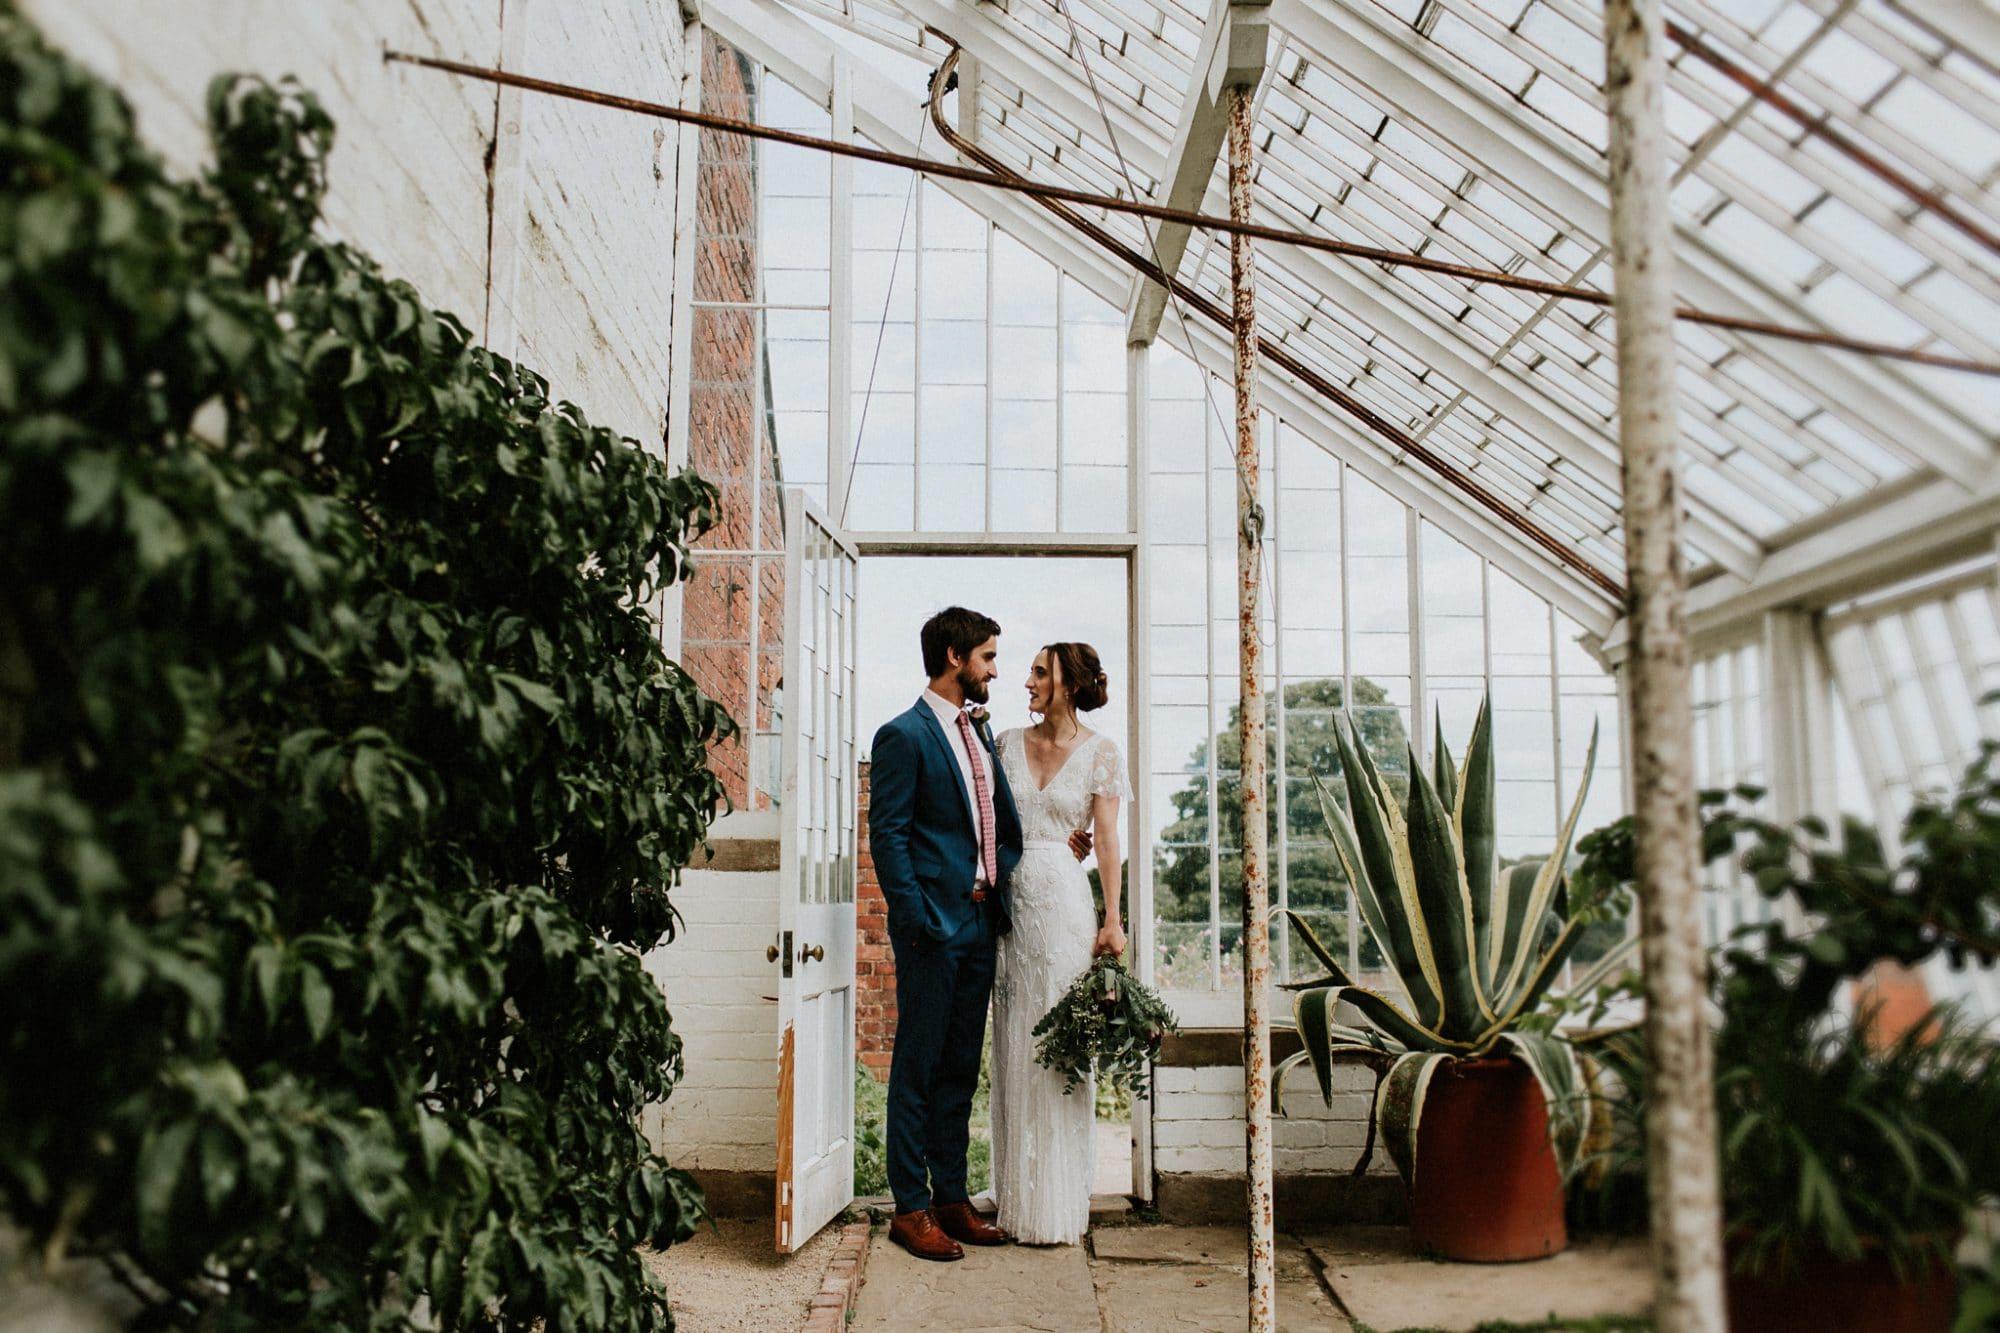 natural wedding photography at calke abbey wedding venue